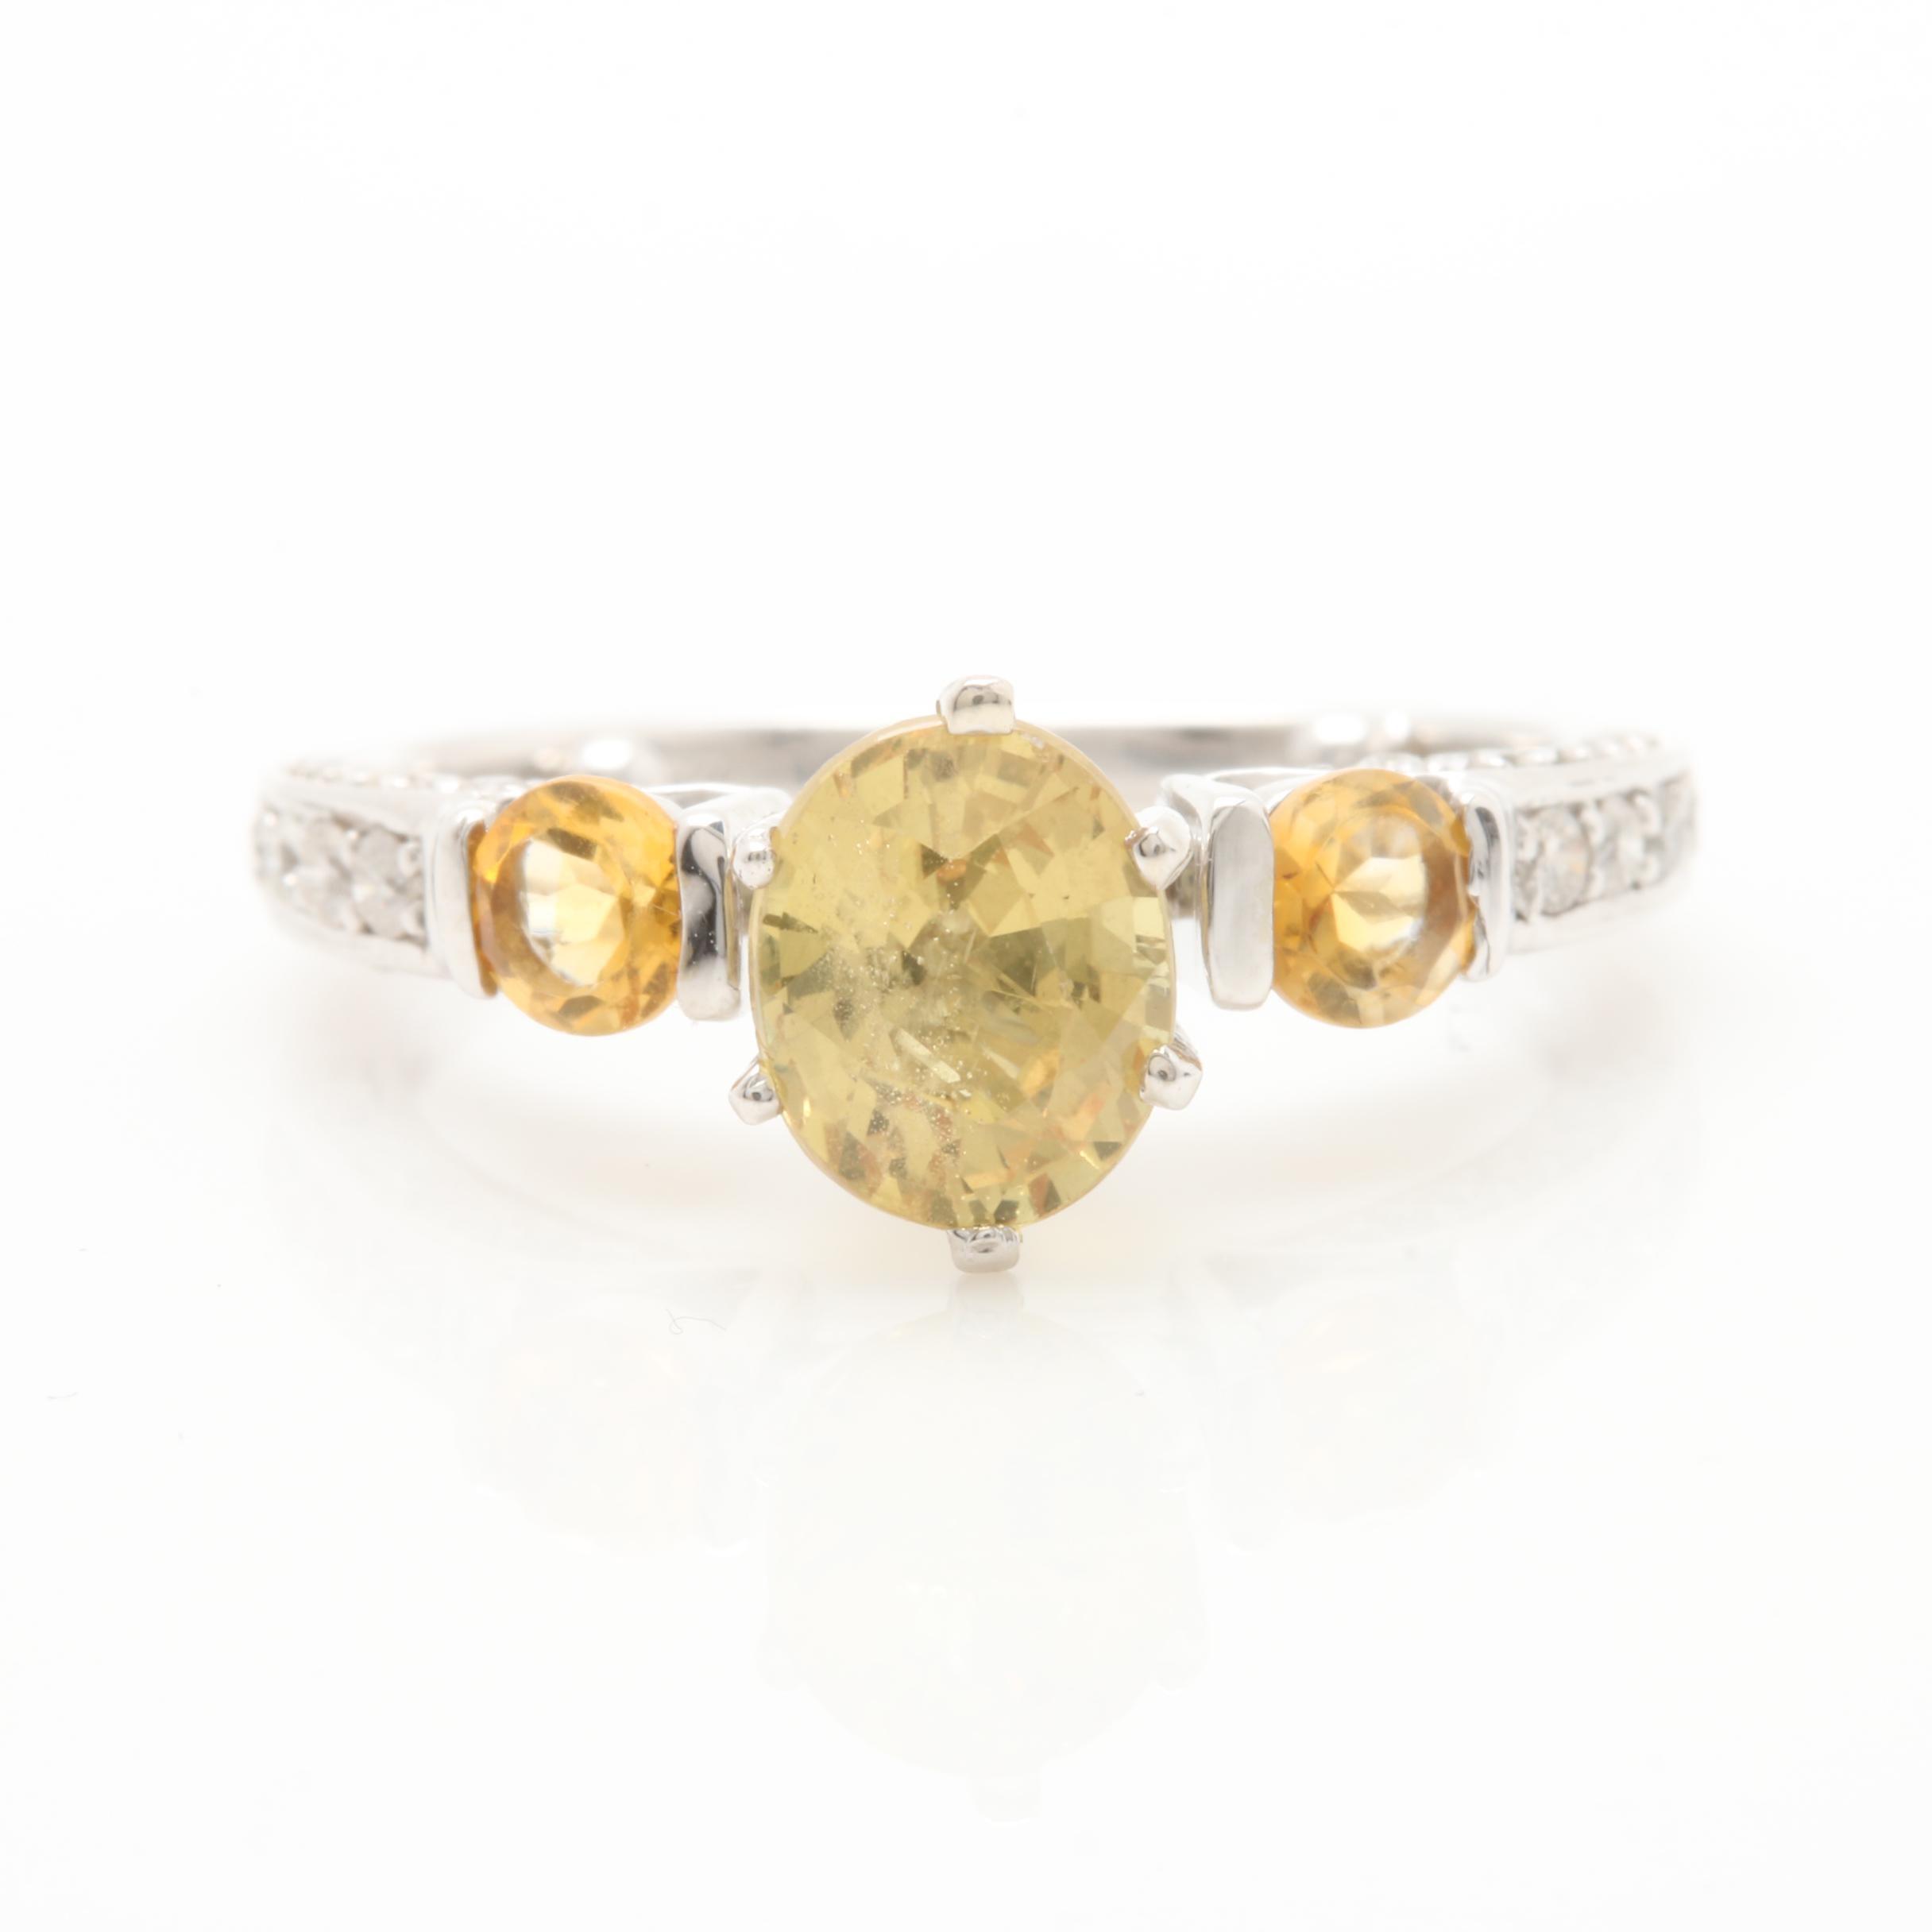 14K White Gold Untreated Yellow Sapphire, Citrine, and Diamond Ring